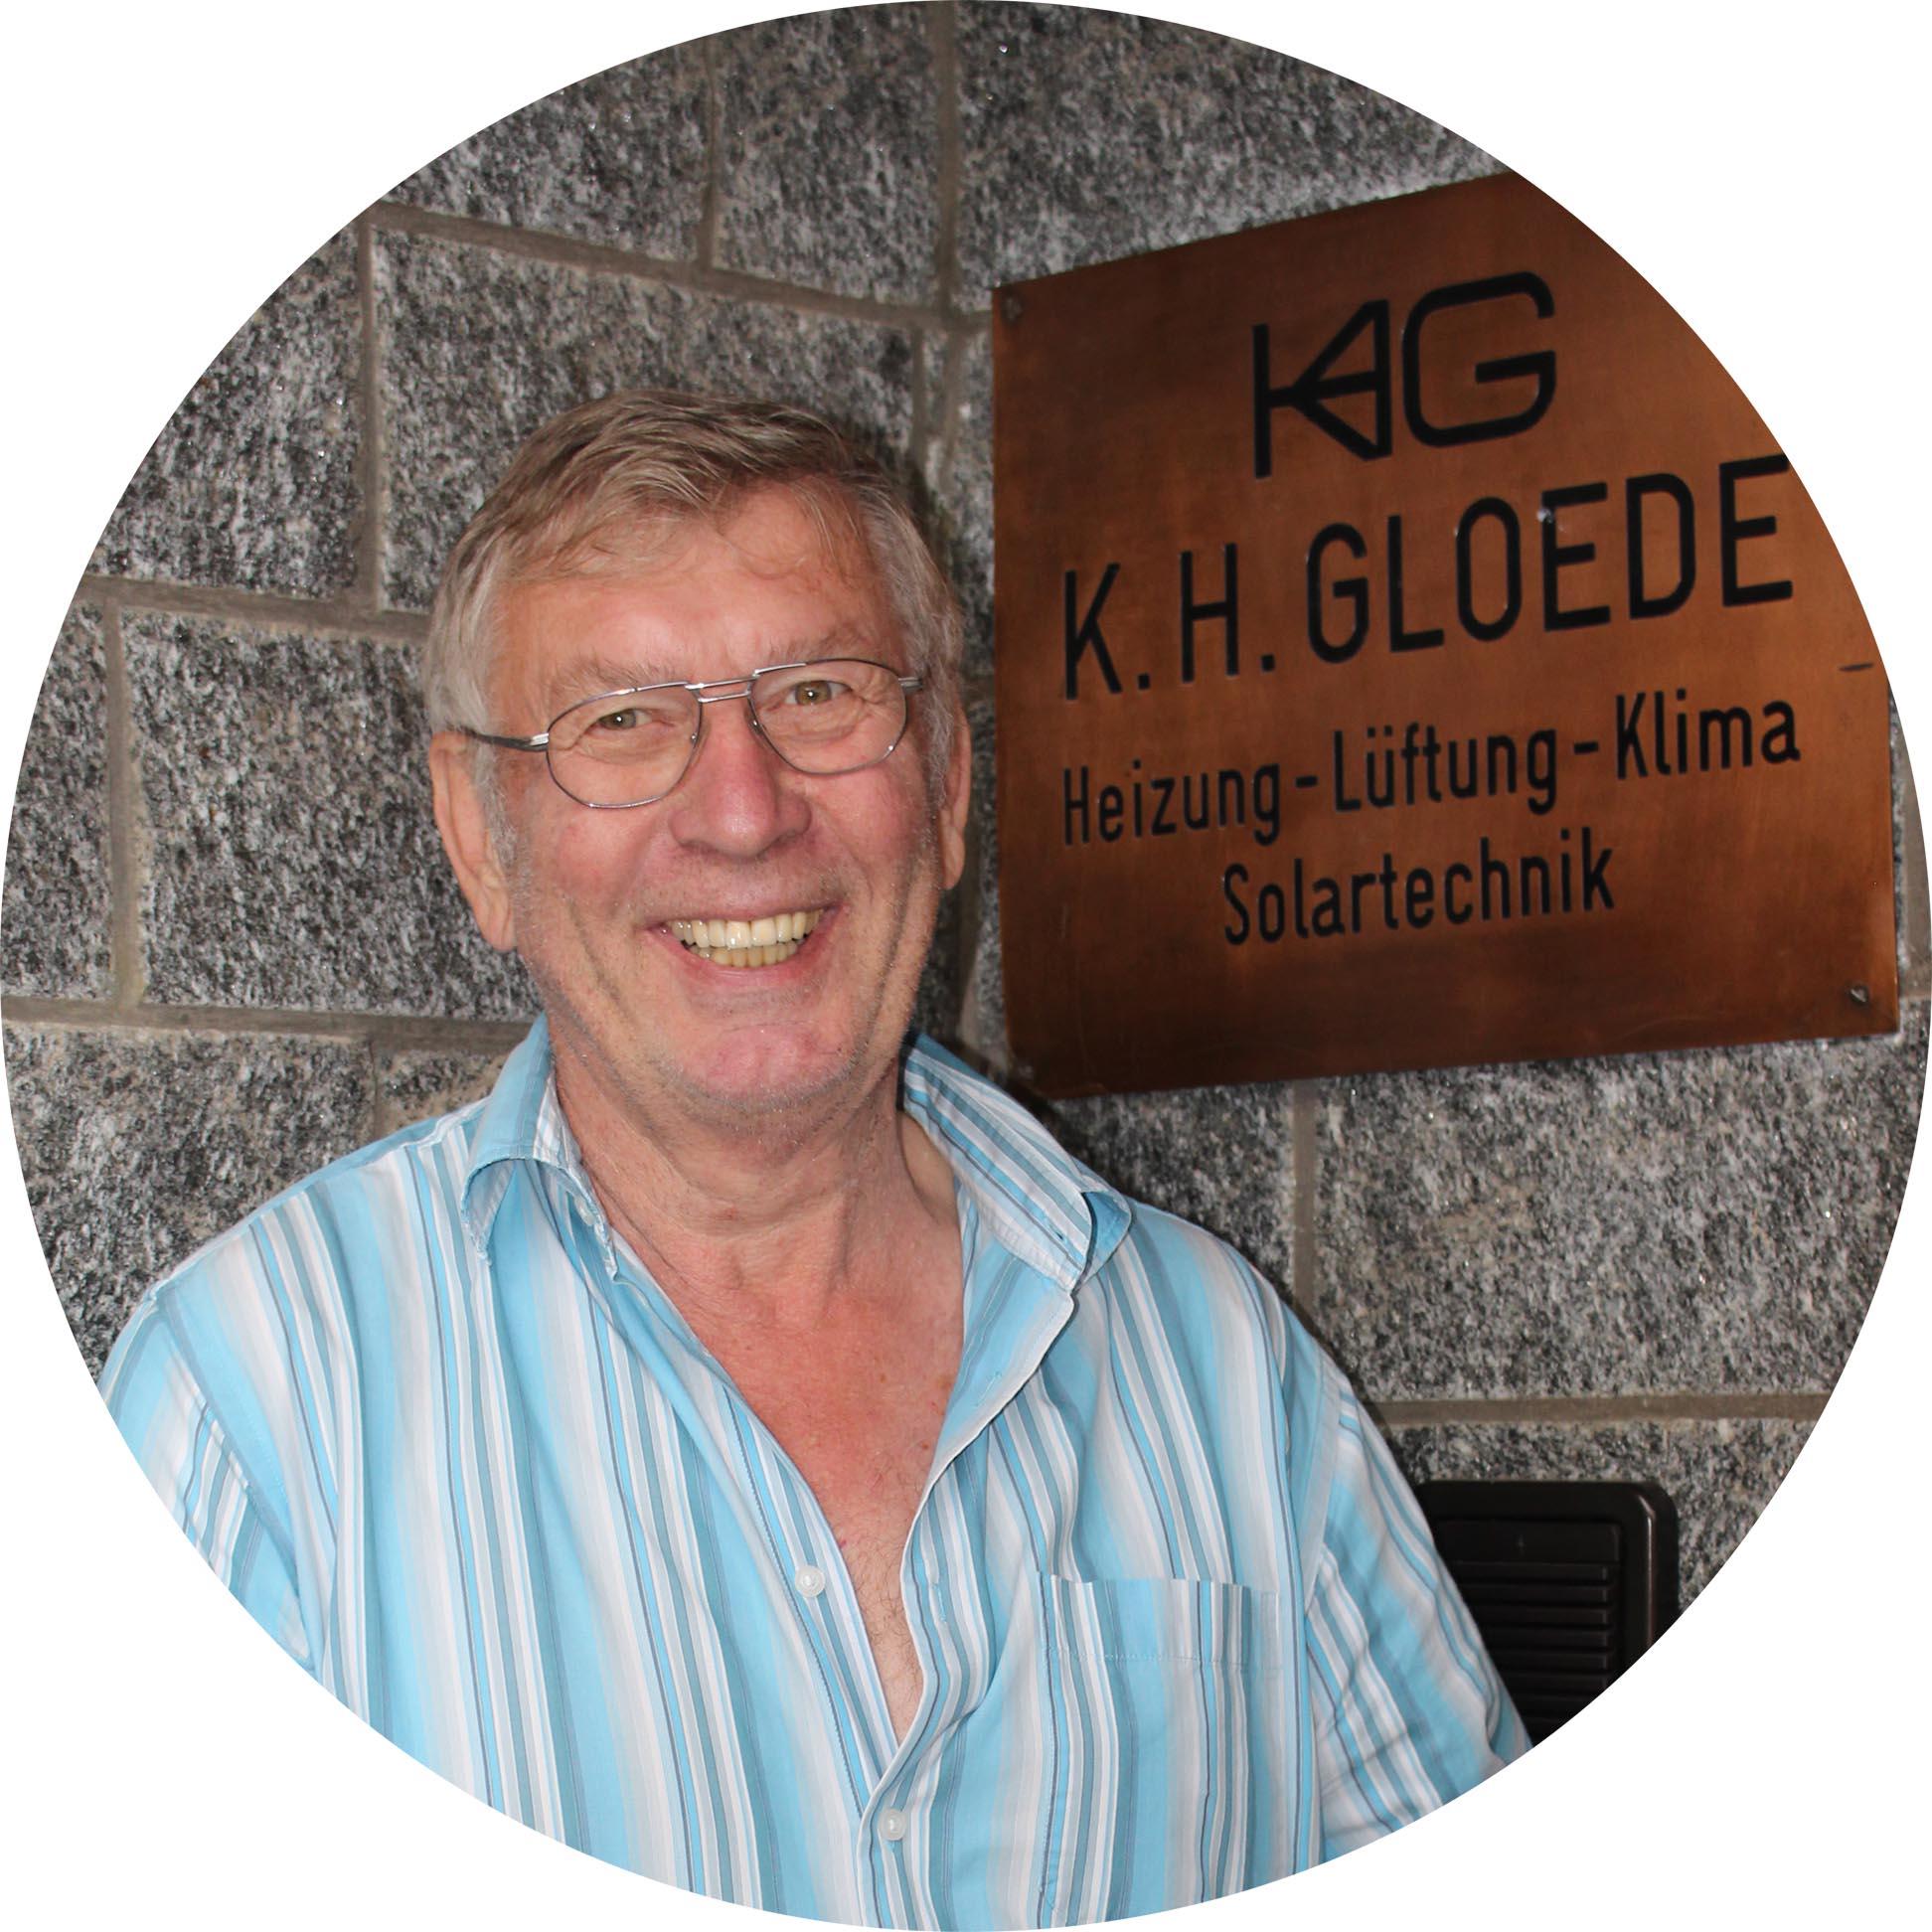 Karl-Heinz Gloede